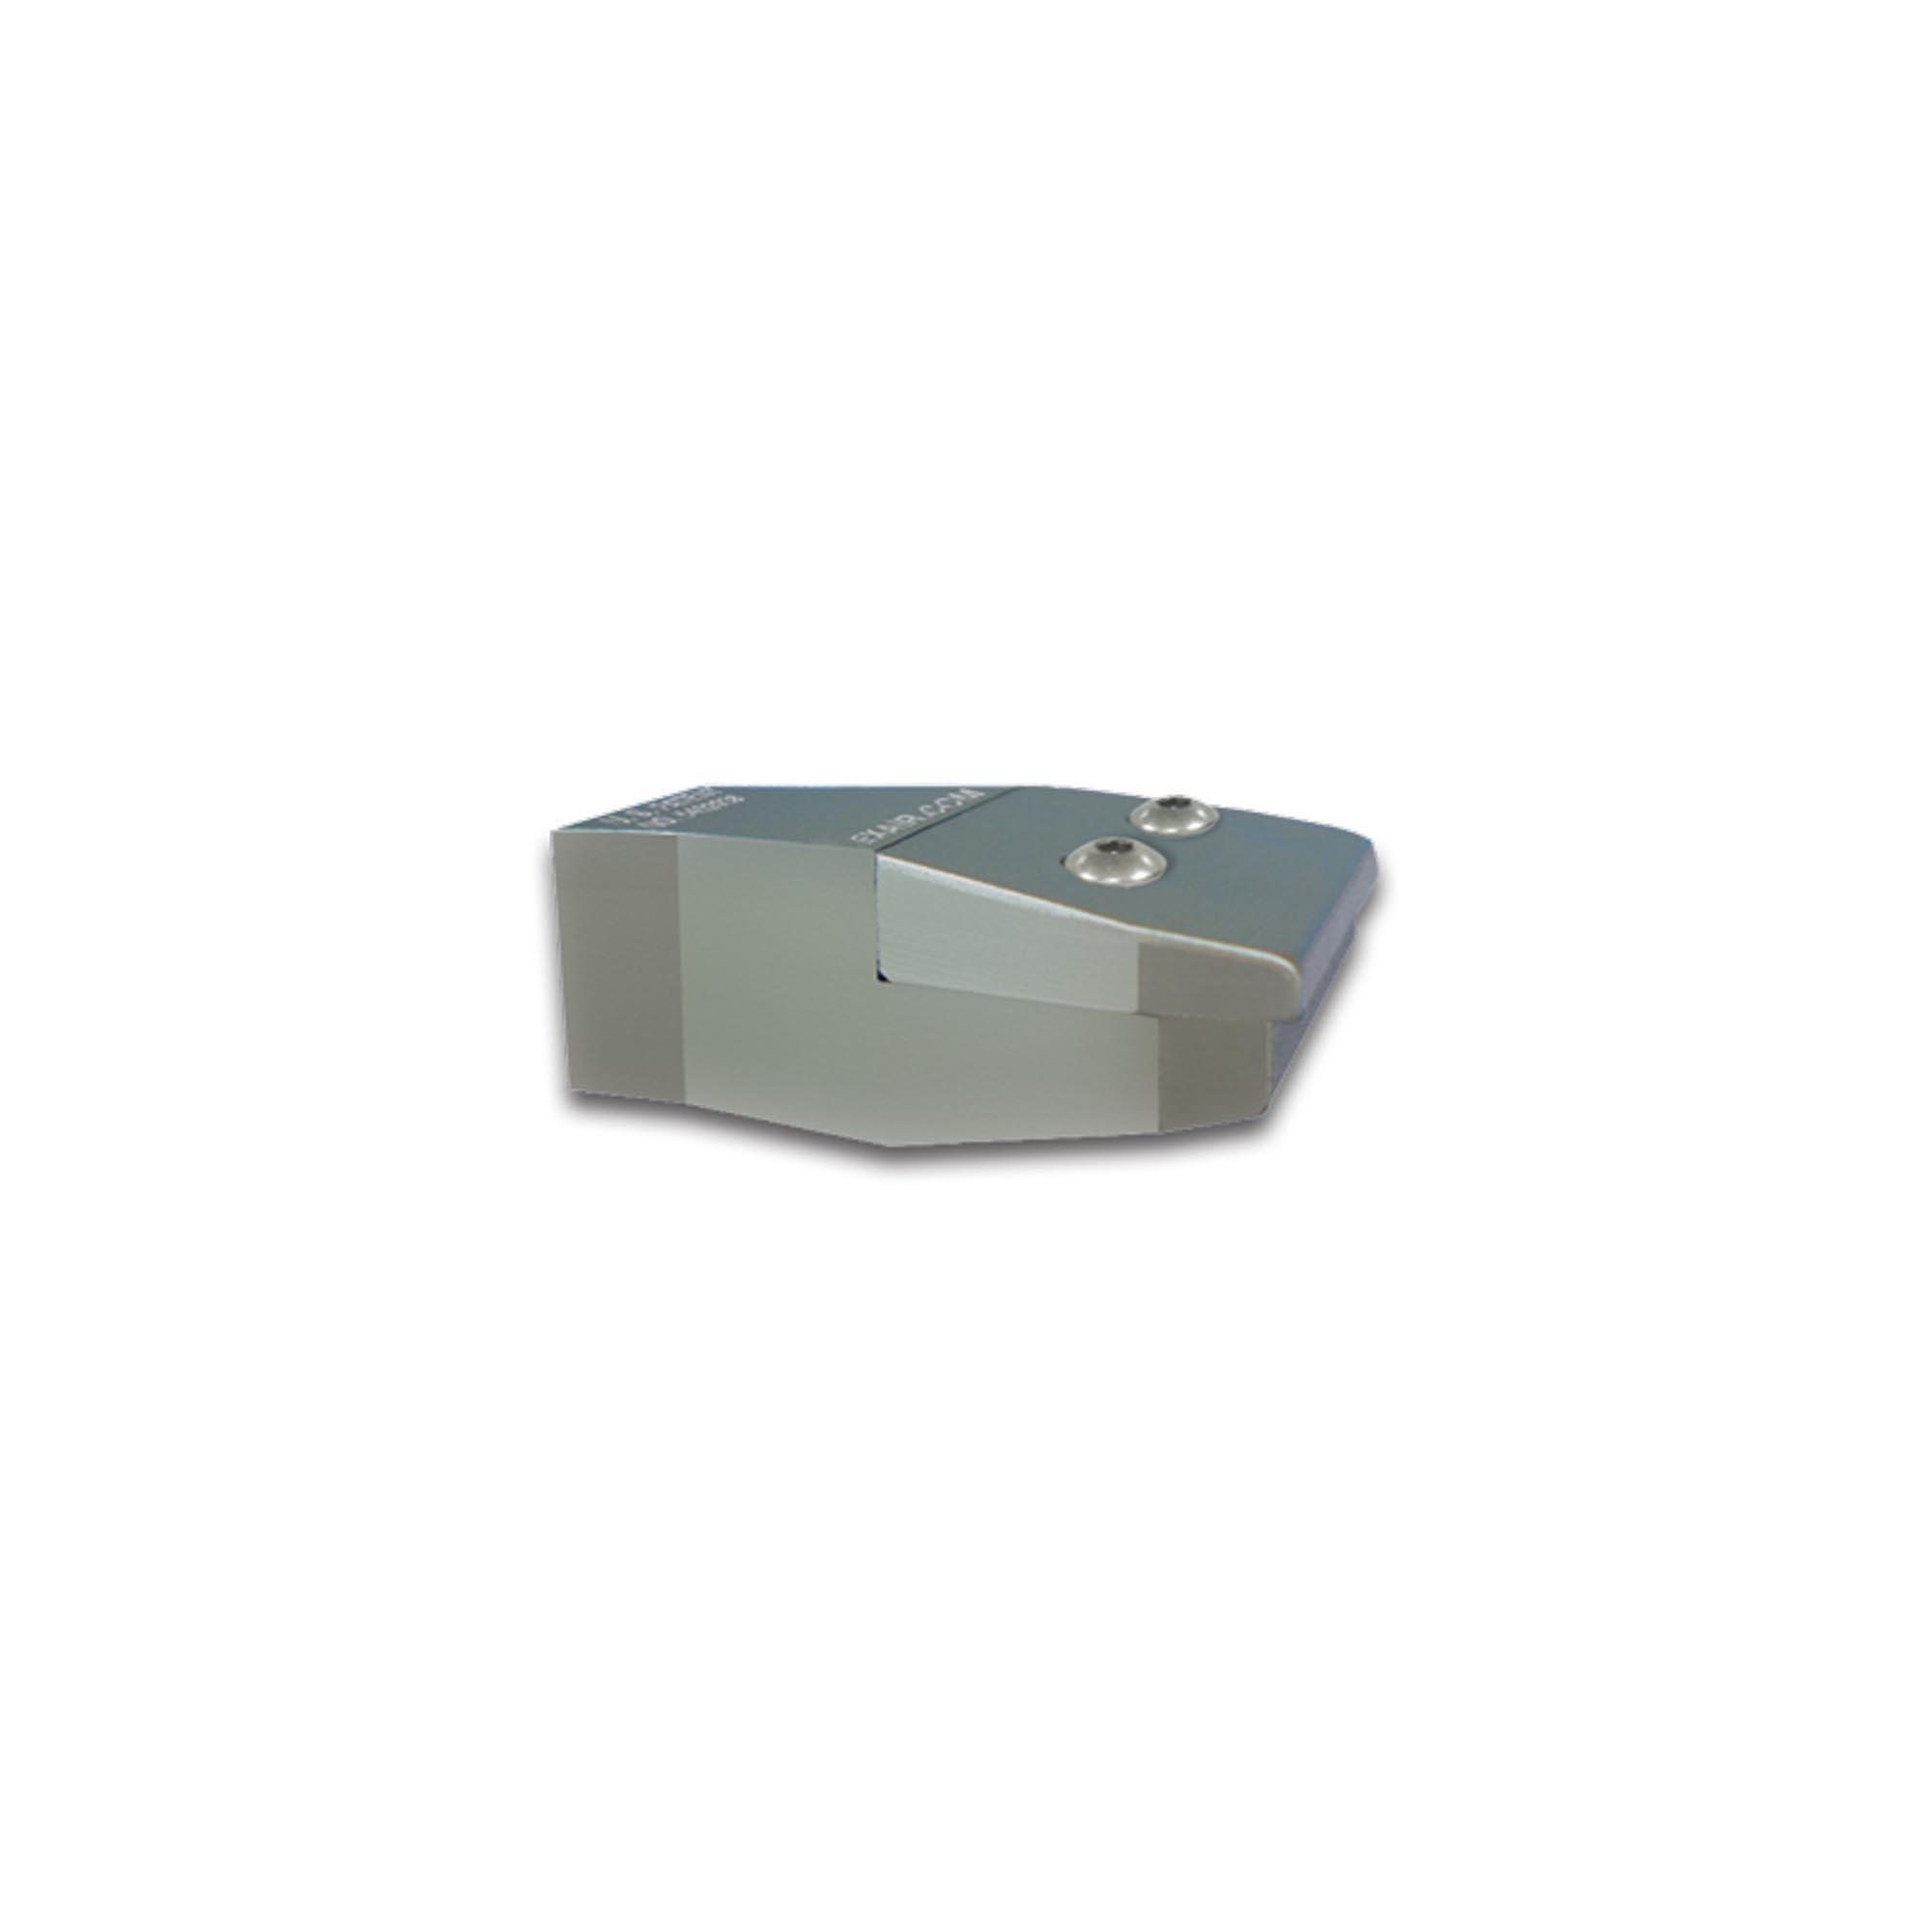 "Model HP1125 1/4 FNPT 2"" High Power Flat Super Air Nozzle"